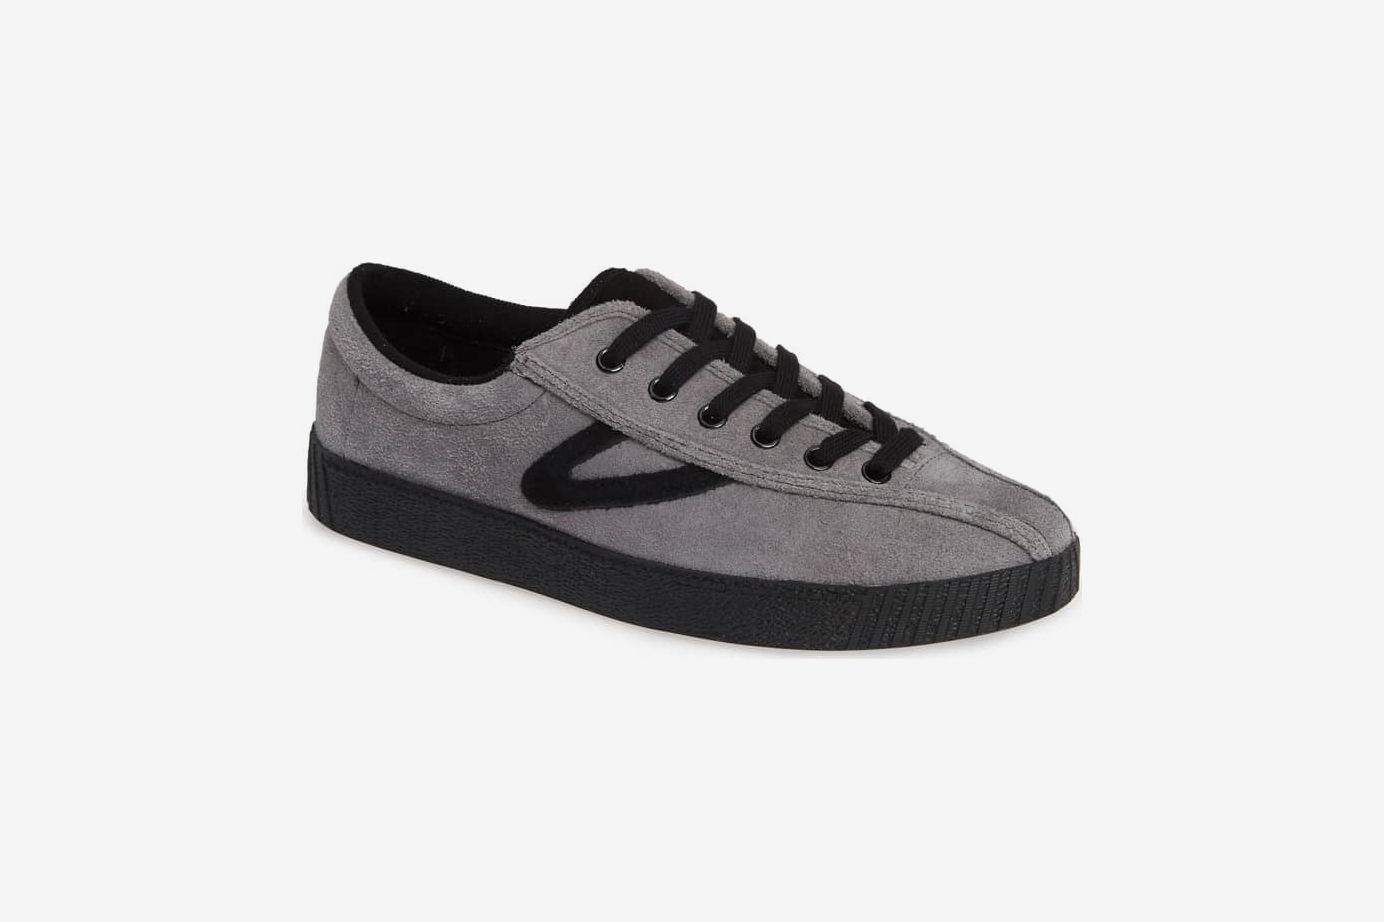 Tretorn Nylite26Plus Sneaker